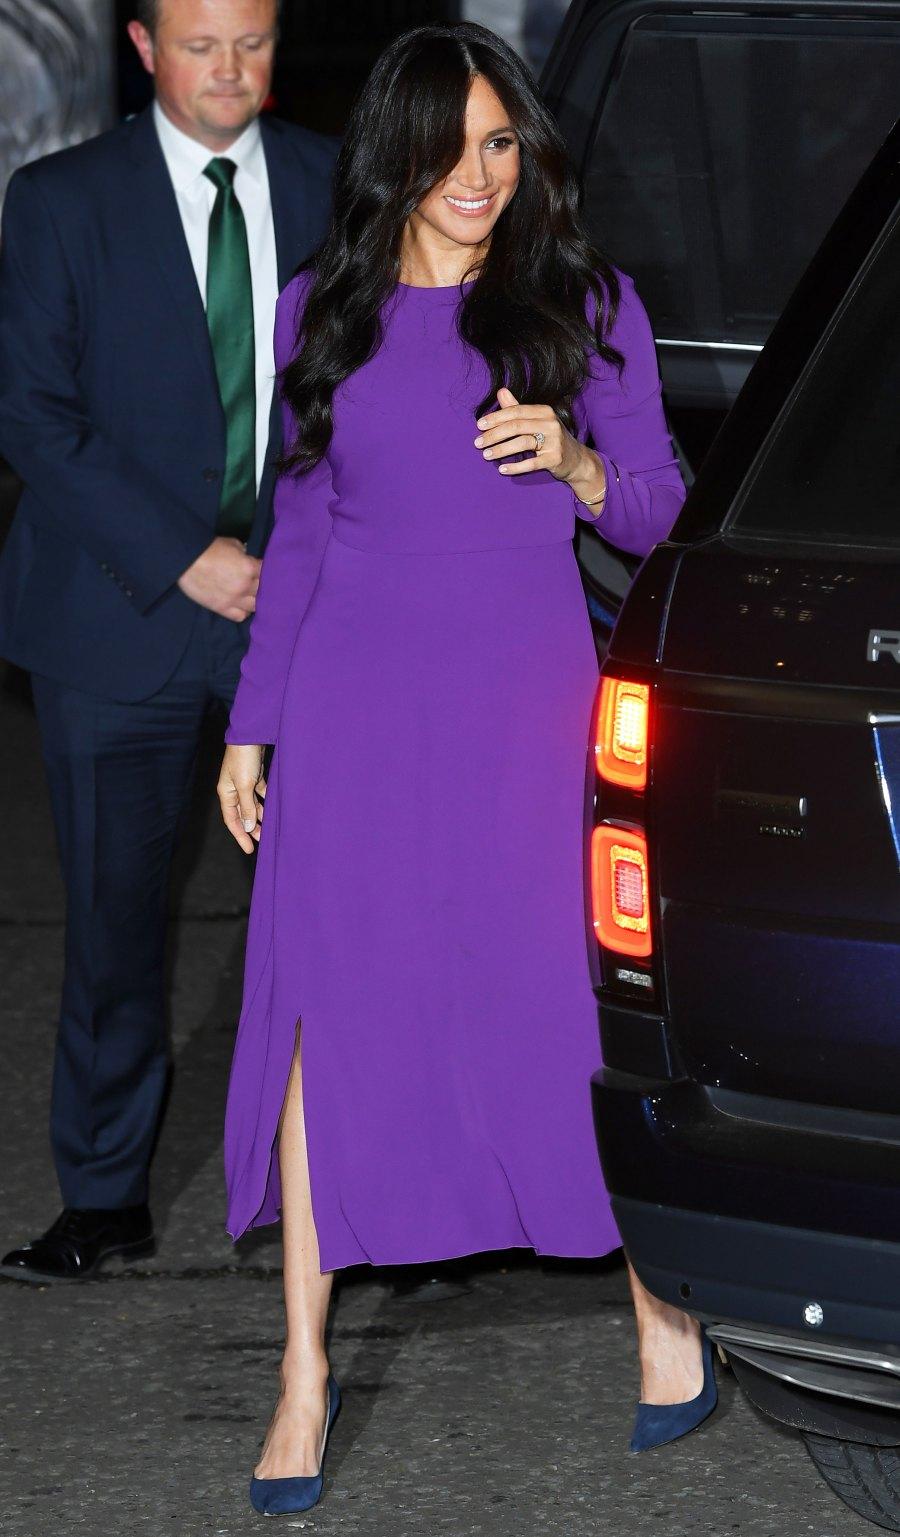 Meghan Markle Purple Dress October 22, 2019